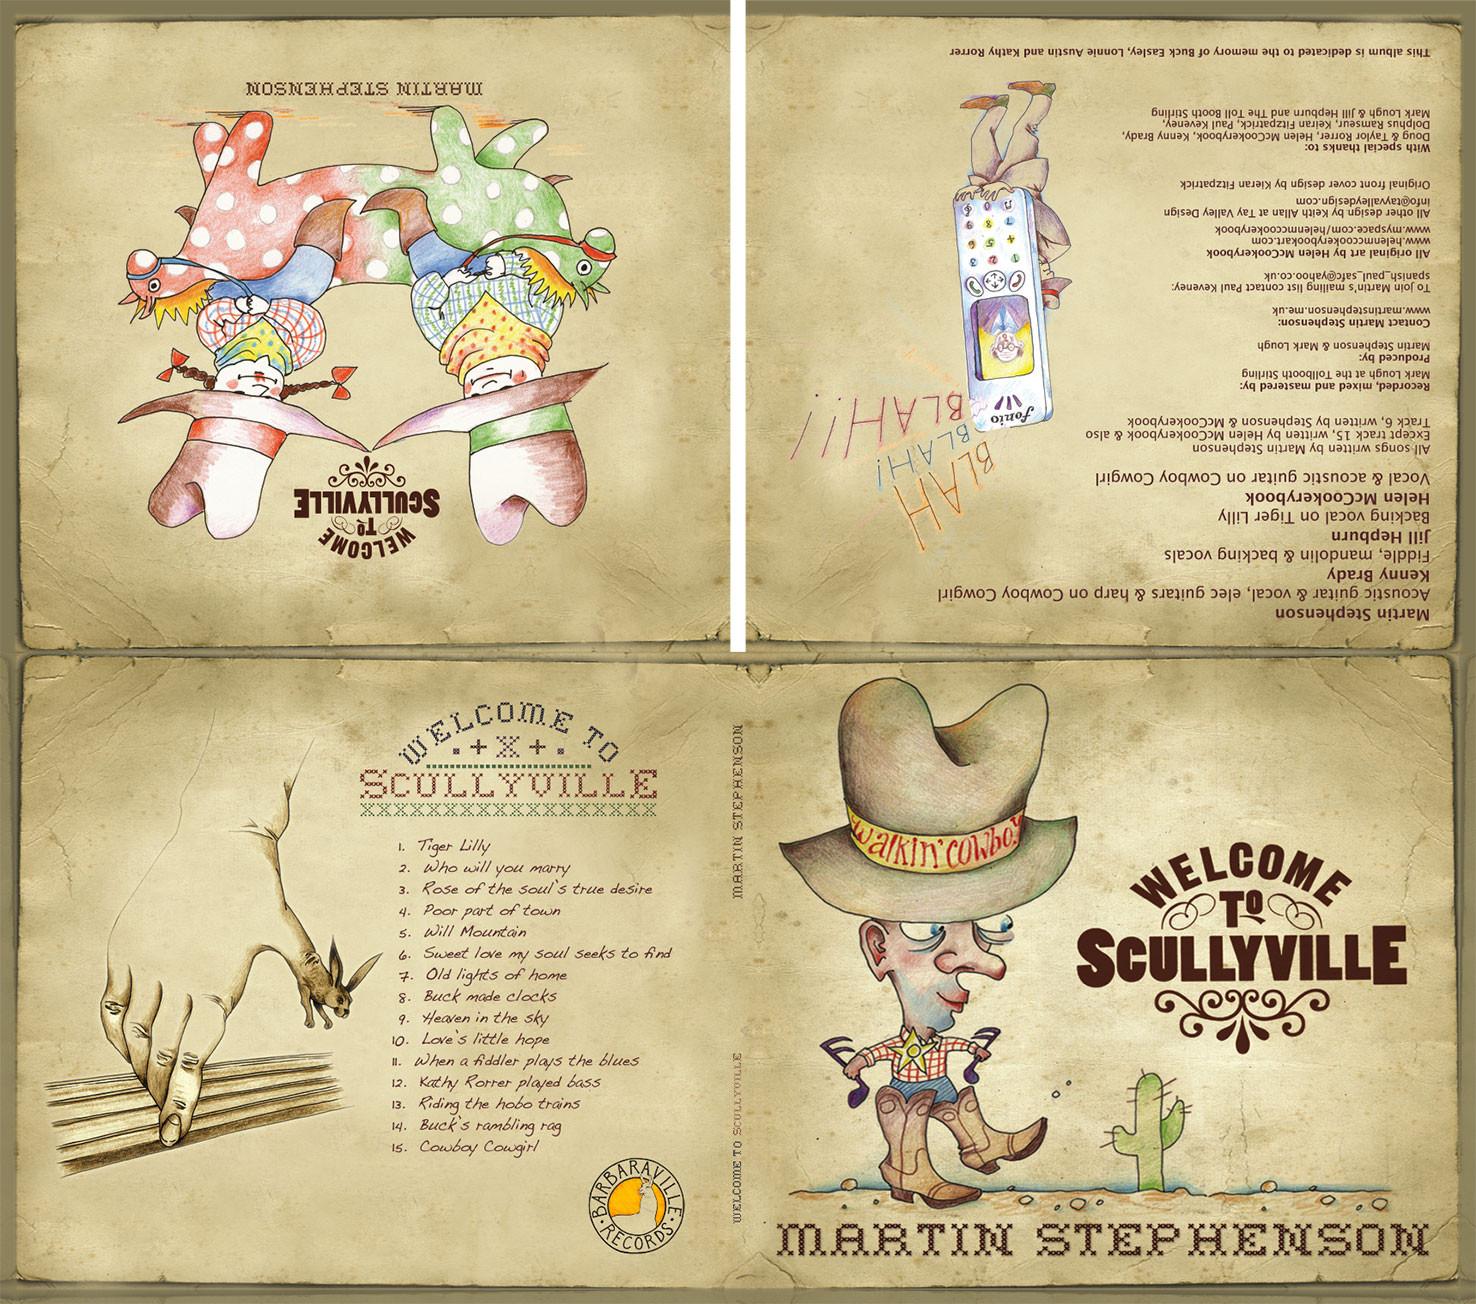 Martin-Stephenson-Album